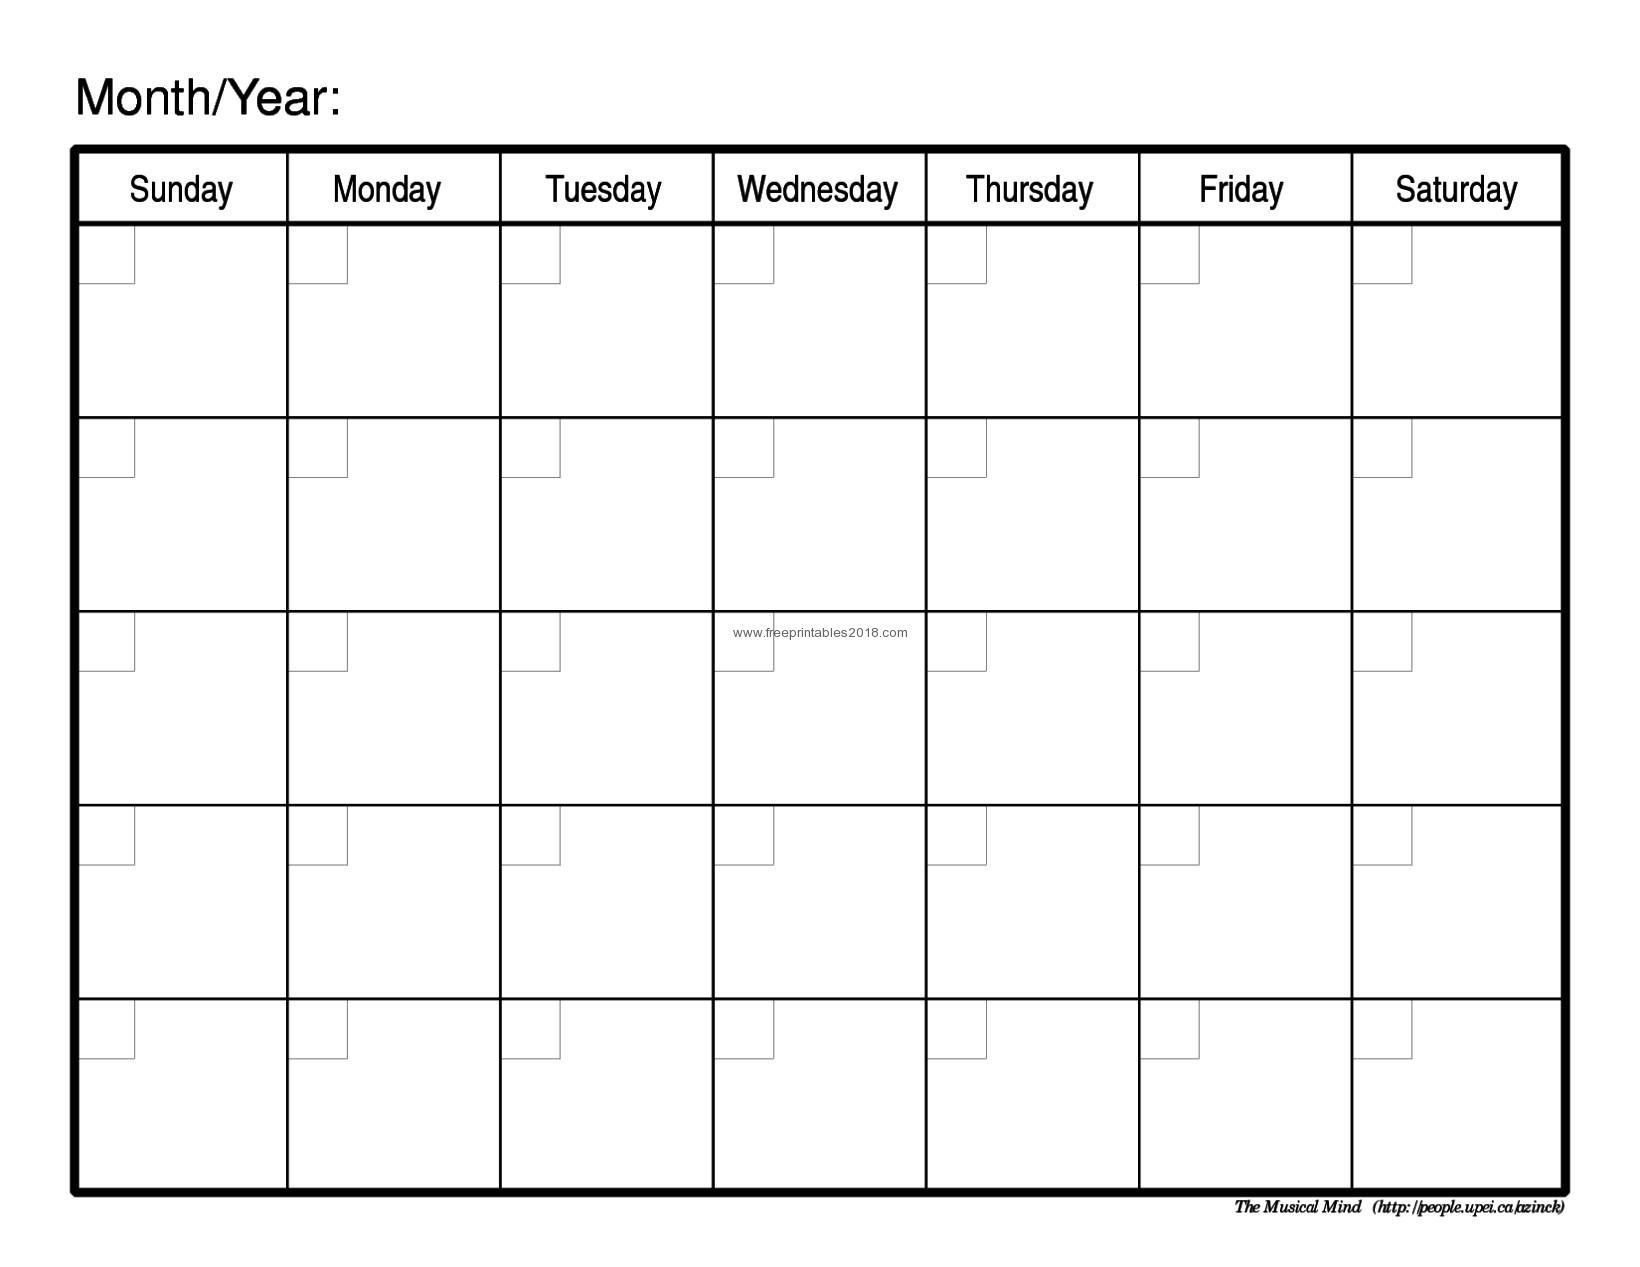 Free Printable Calendar Blank Free Printable Blank Calendar regarding Free Blank Printable Calendar Template